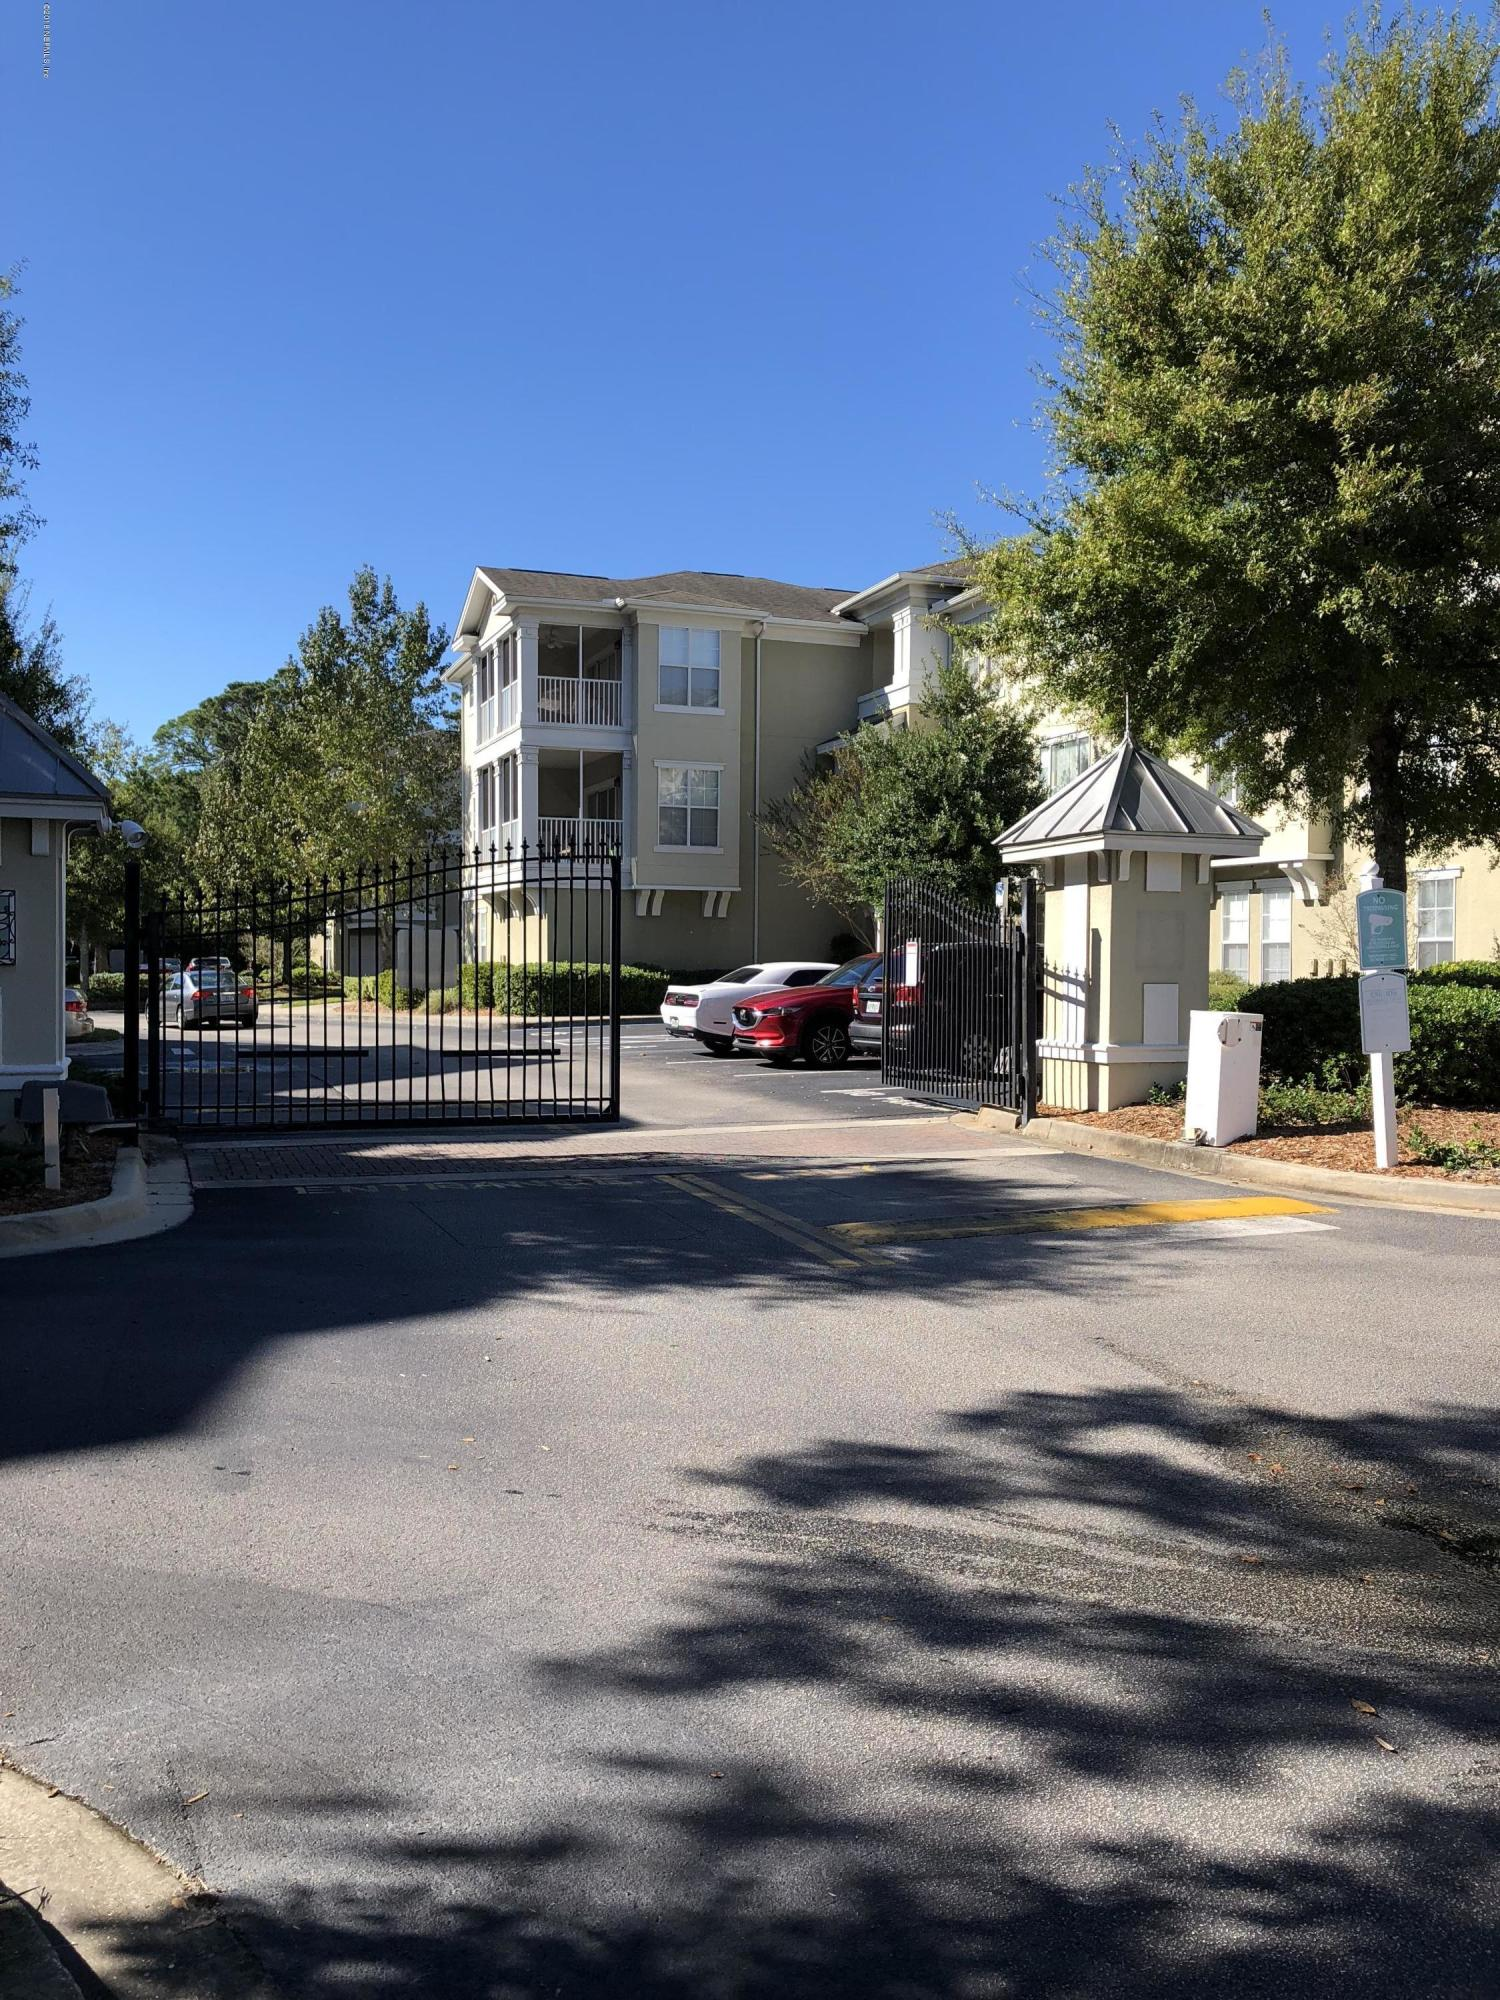 8290 GATE- JACKSONVILLE- FLORIDA 32216, 3 Bedrooms Bedrooms, ,3 BathroomsBathrooms,Condo,For sale,GATE,970250